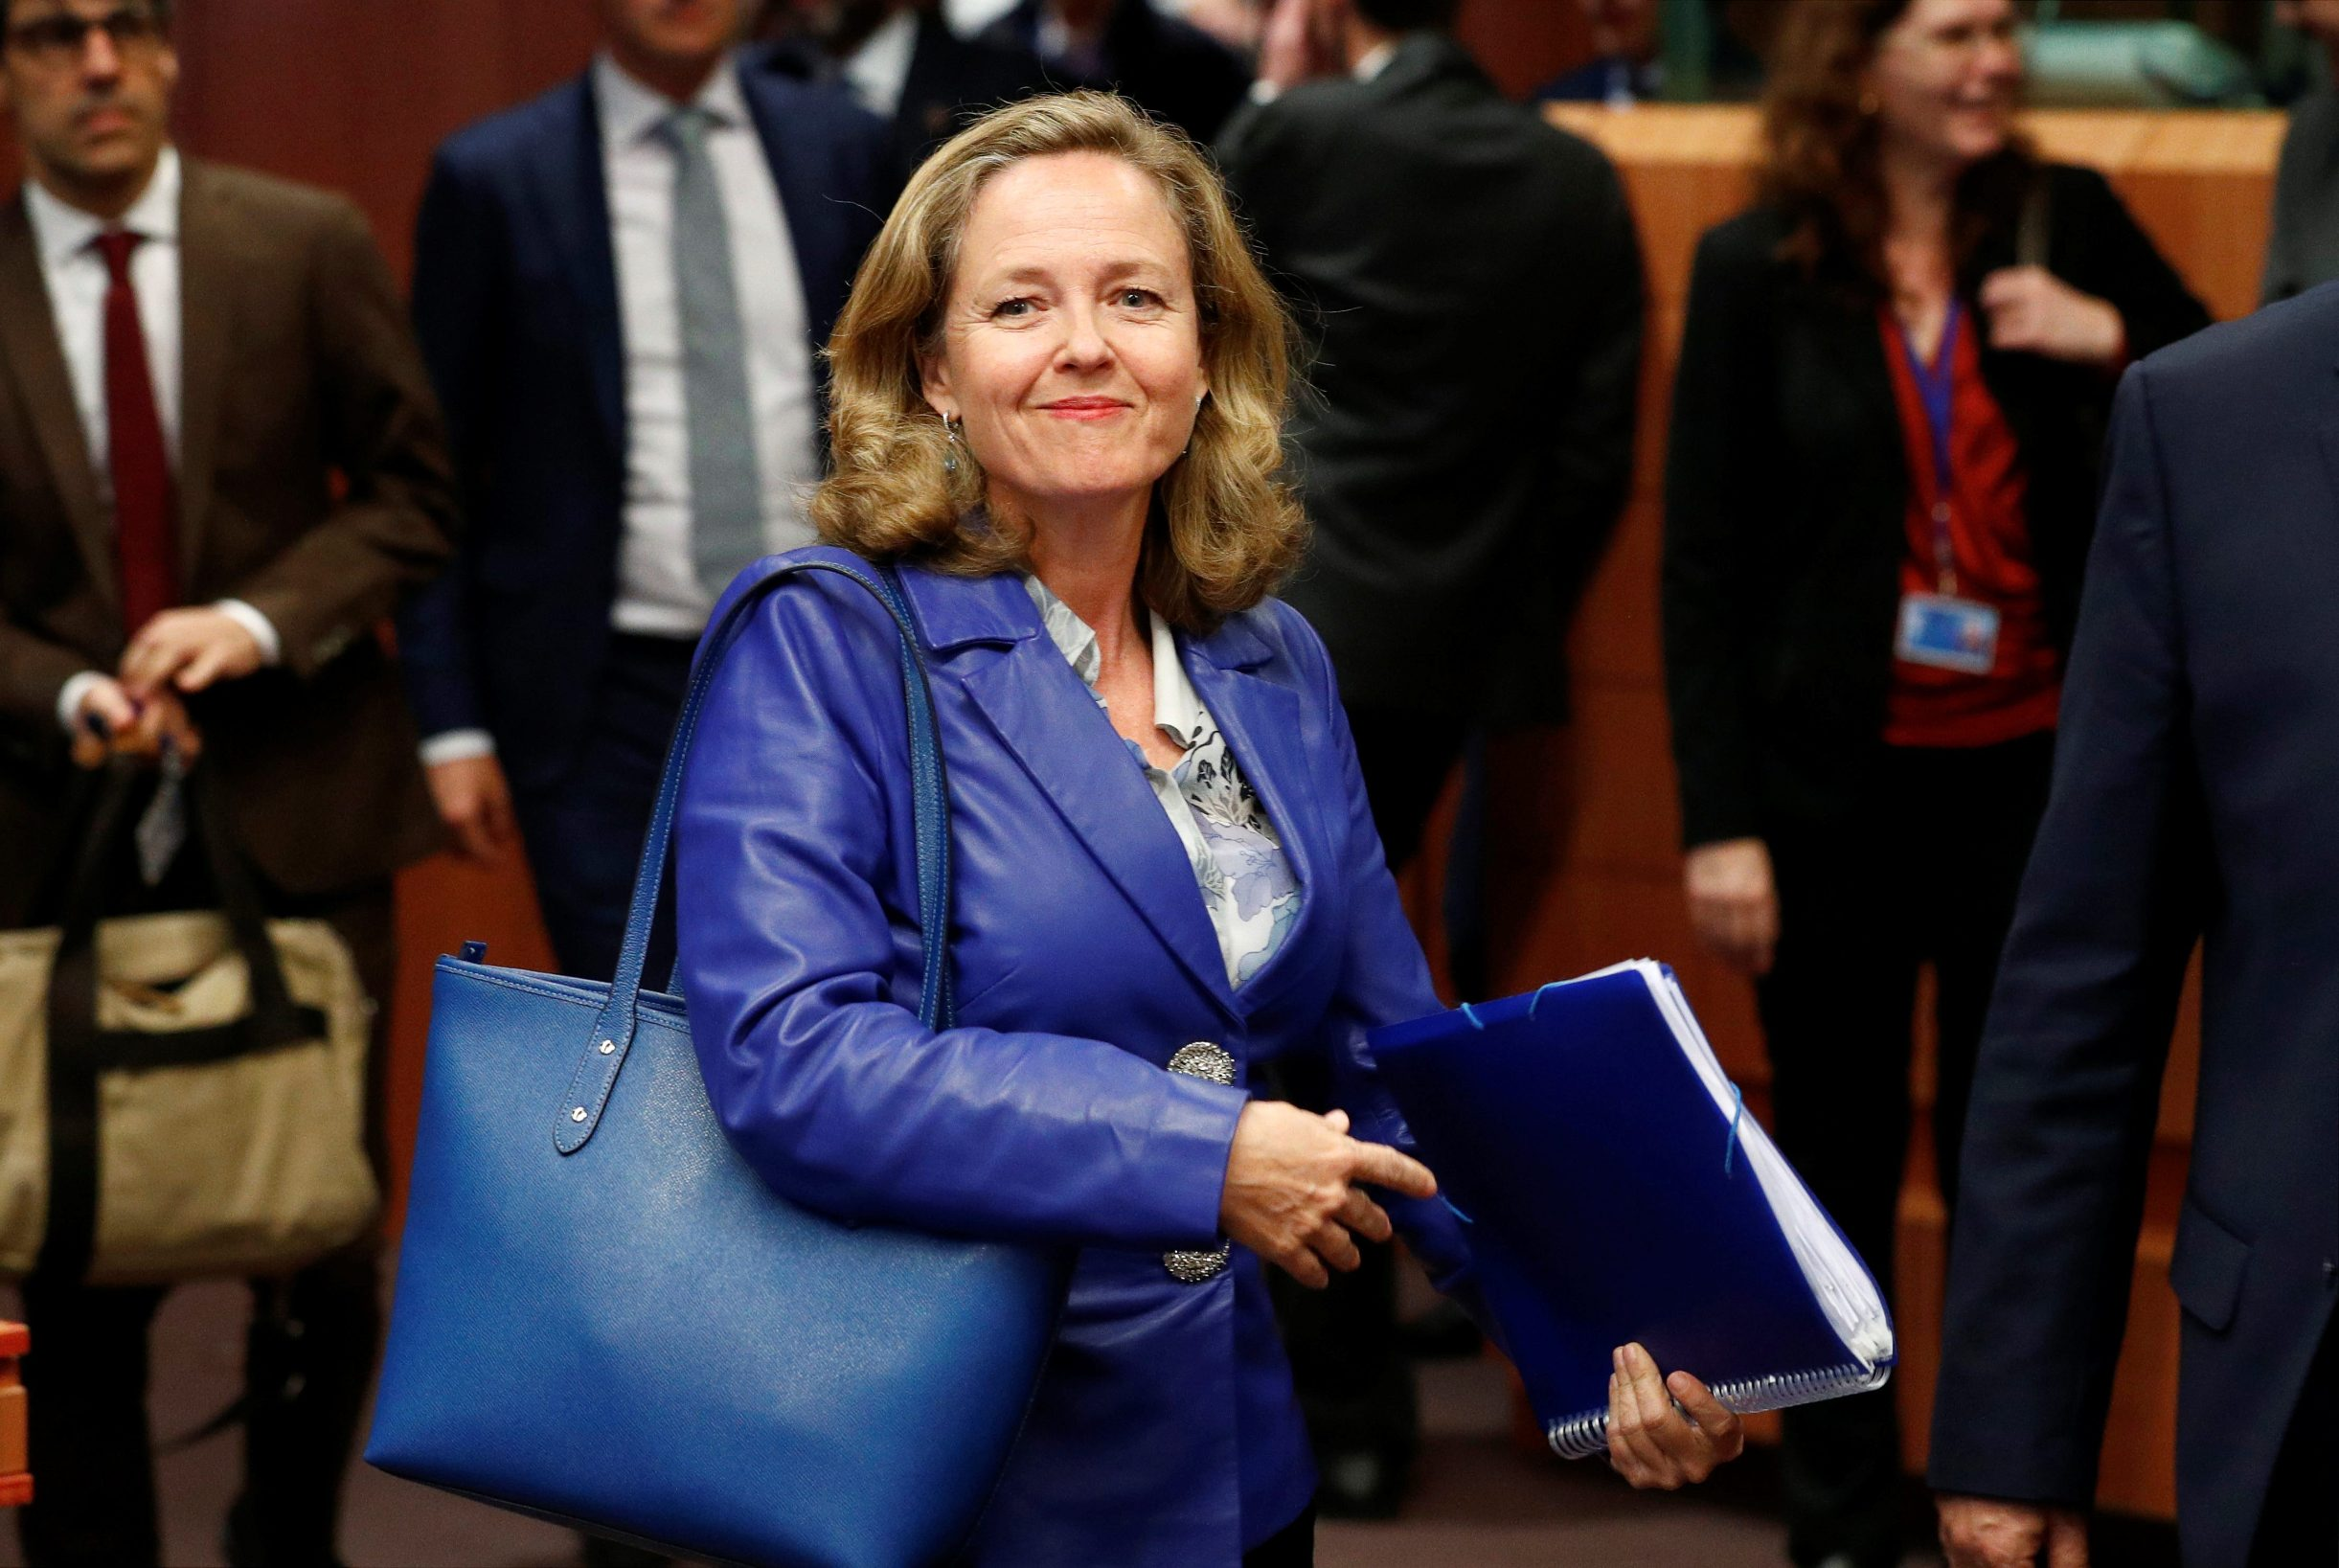 Nadia Calvino, španjolska ministrica ekonomije, bila je na sastanku u Bruxellesu